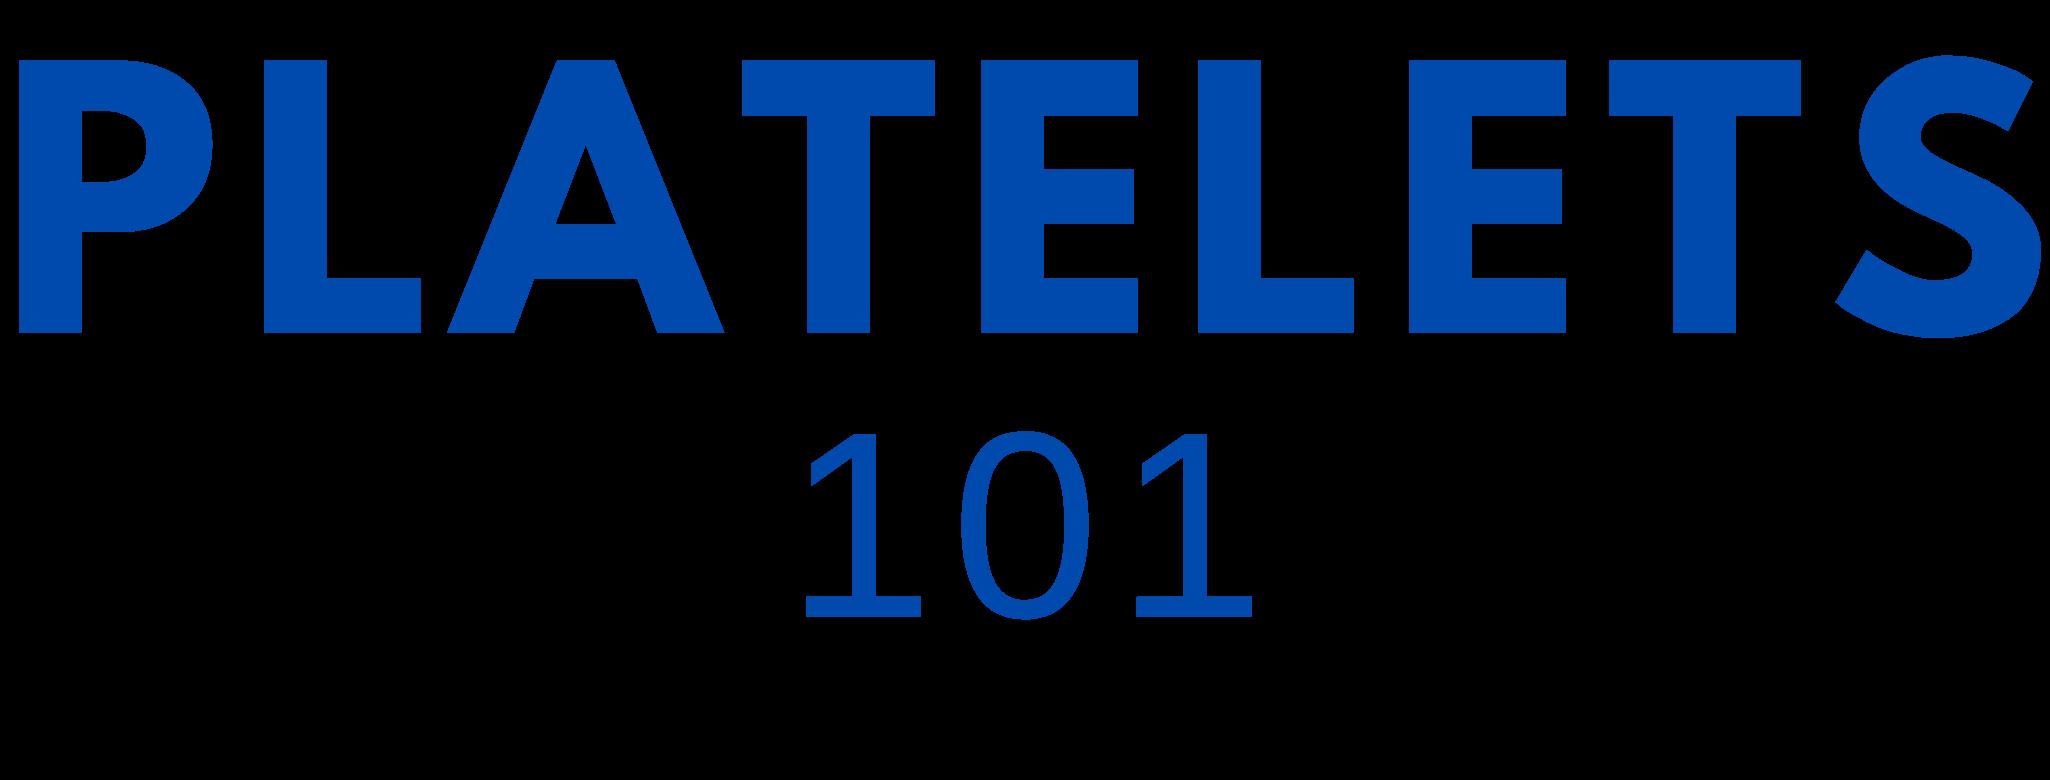 Platelets 101